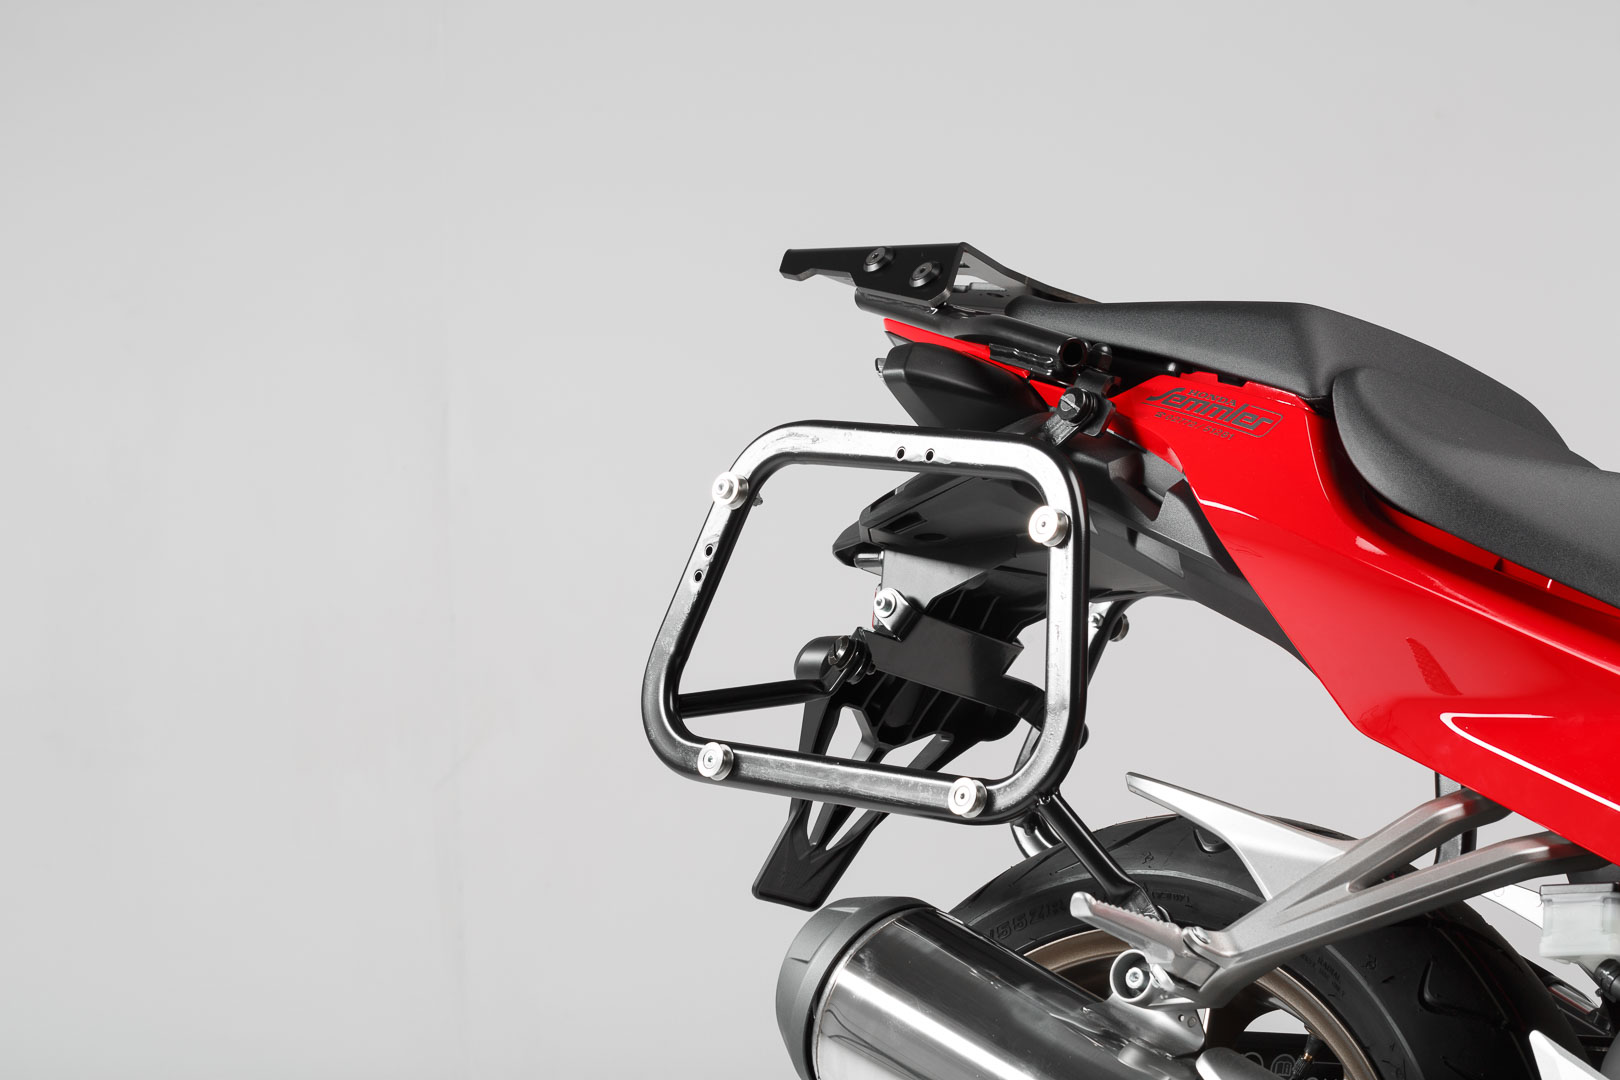 SW-Motech Zijkofferrek Quick-Lock Evo Honda VFR 800 F (14-)